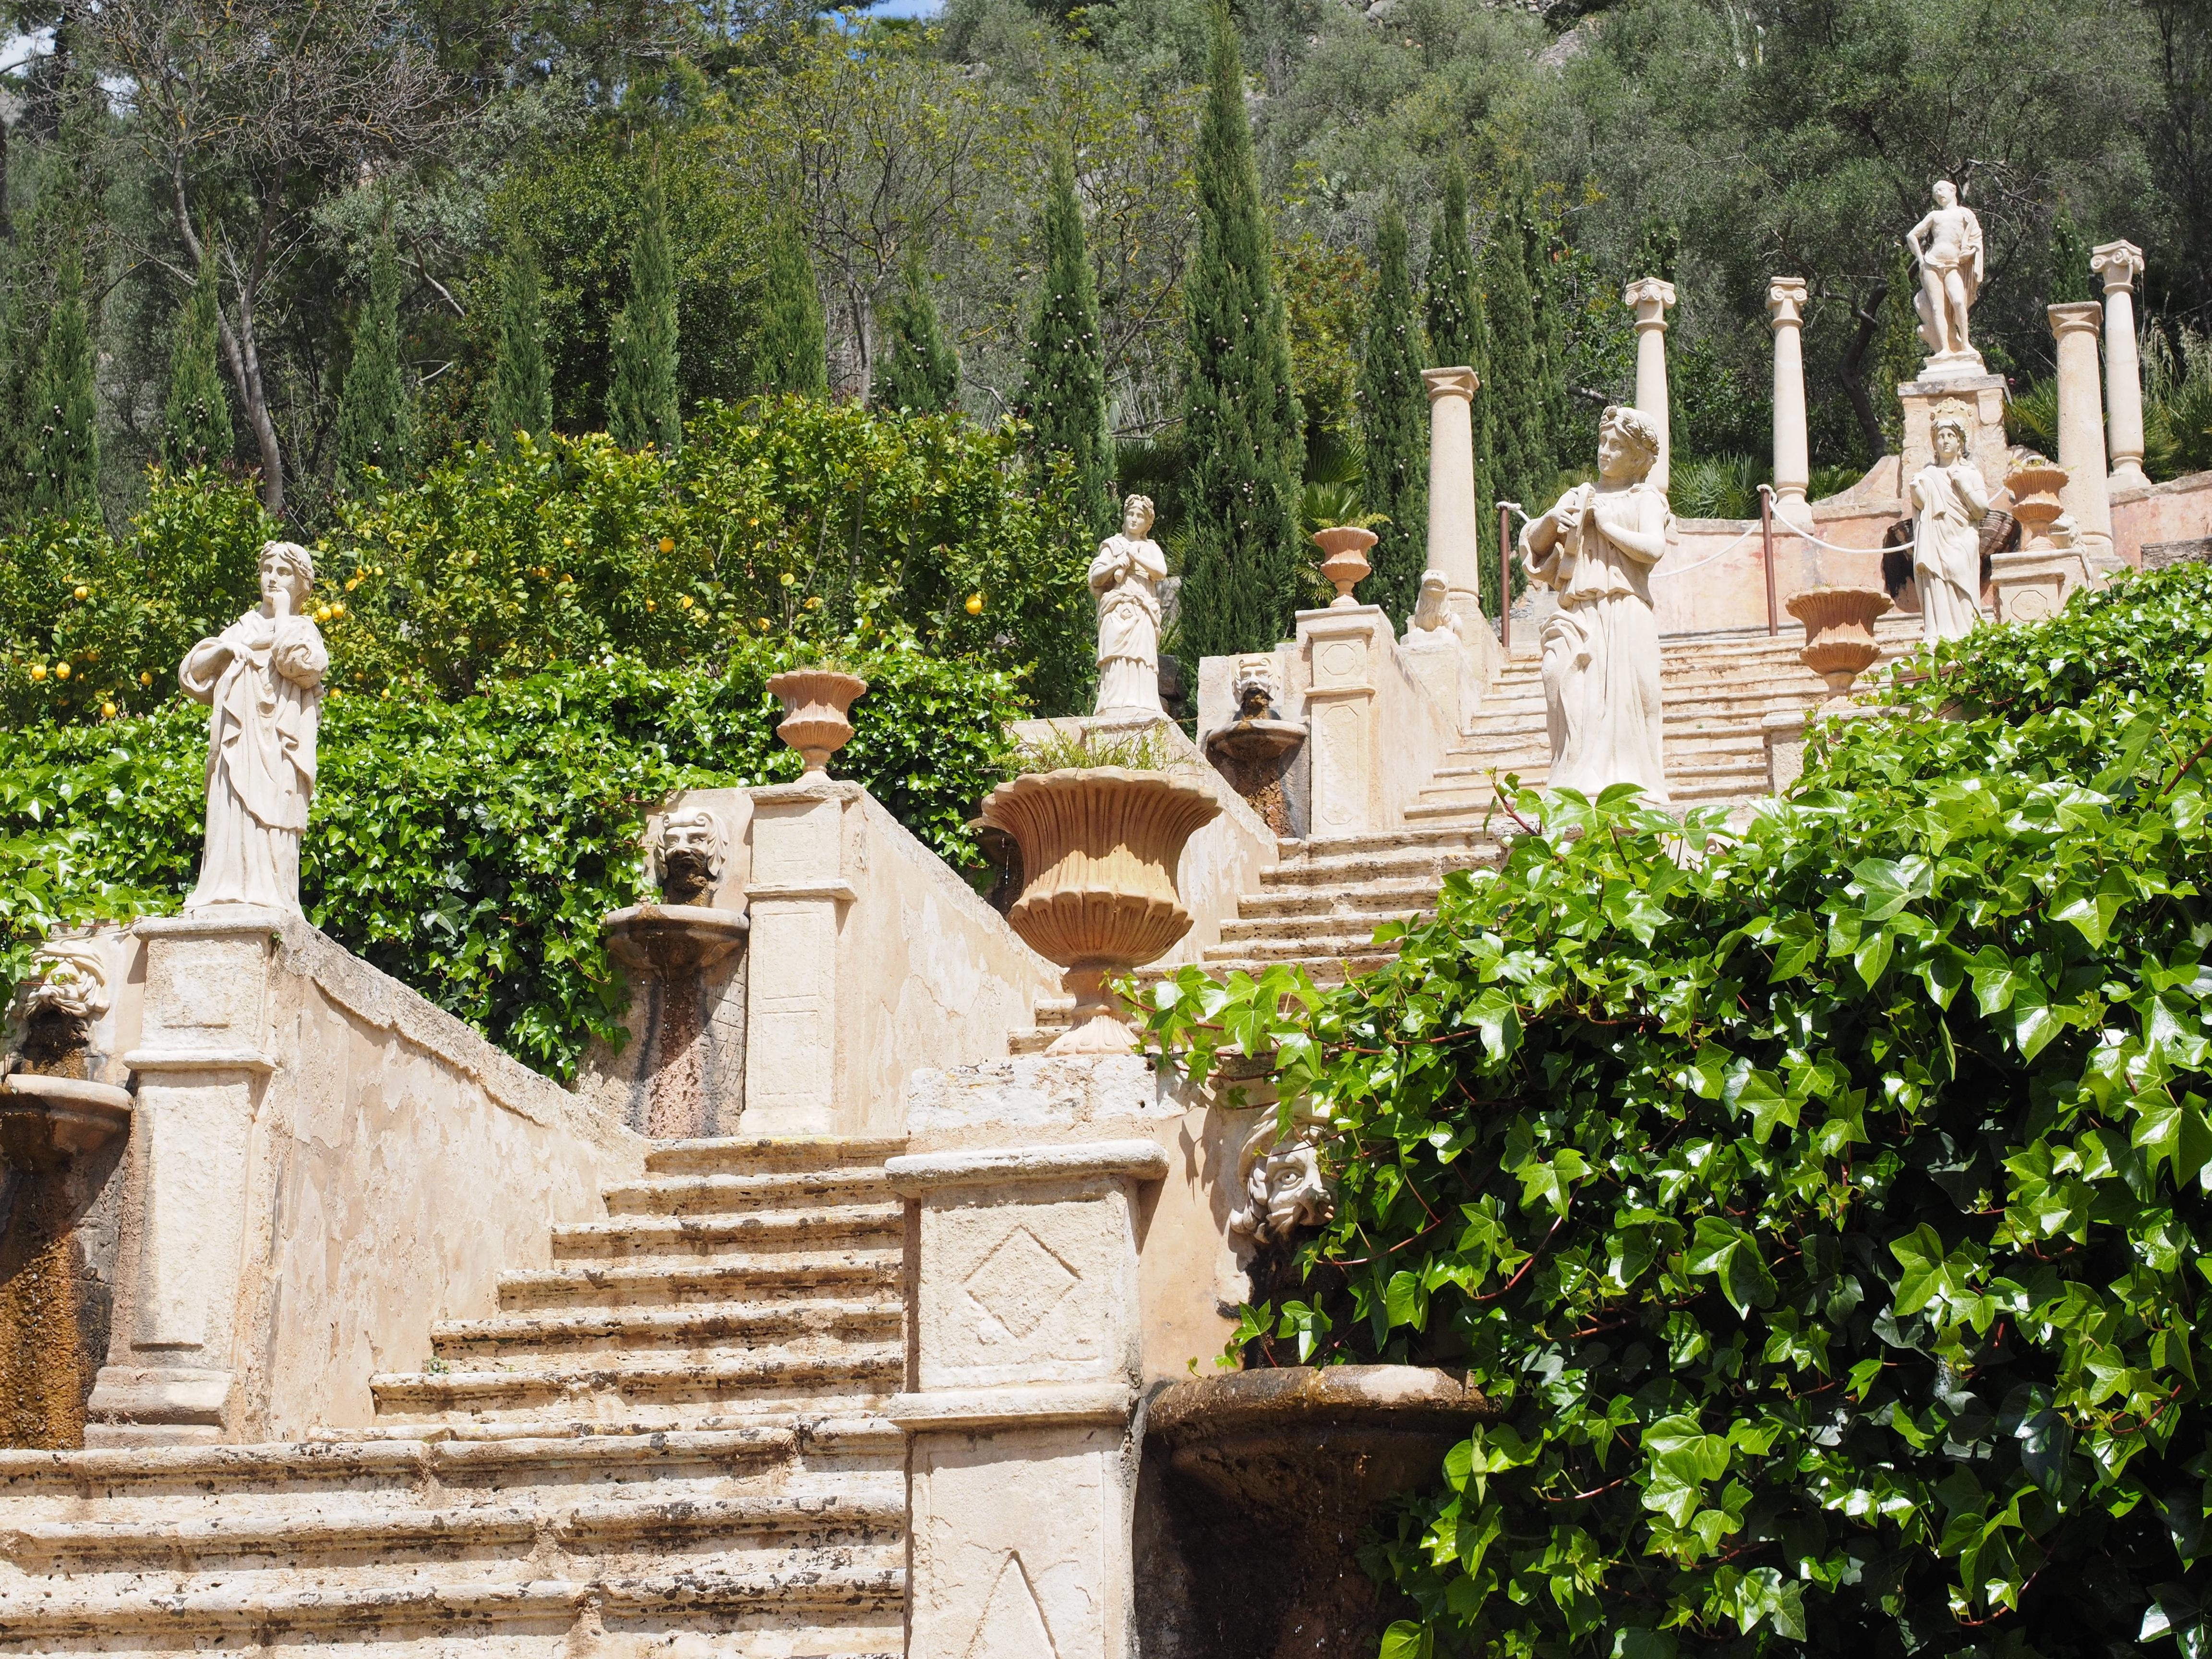 Fotos gratis escalera monumento cementerio jard n for Cementerio jardin